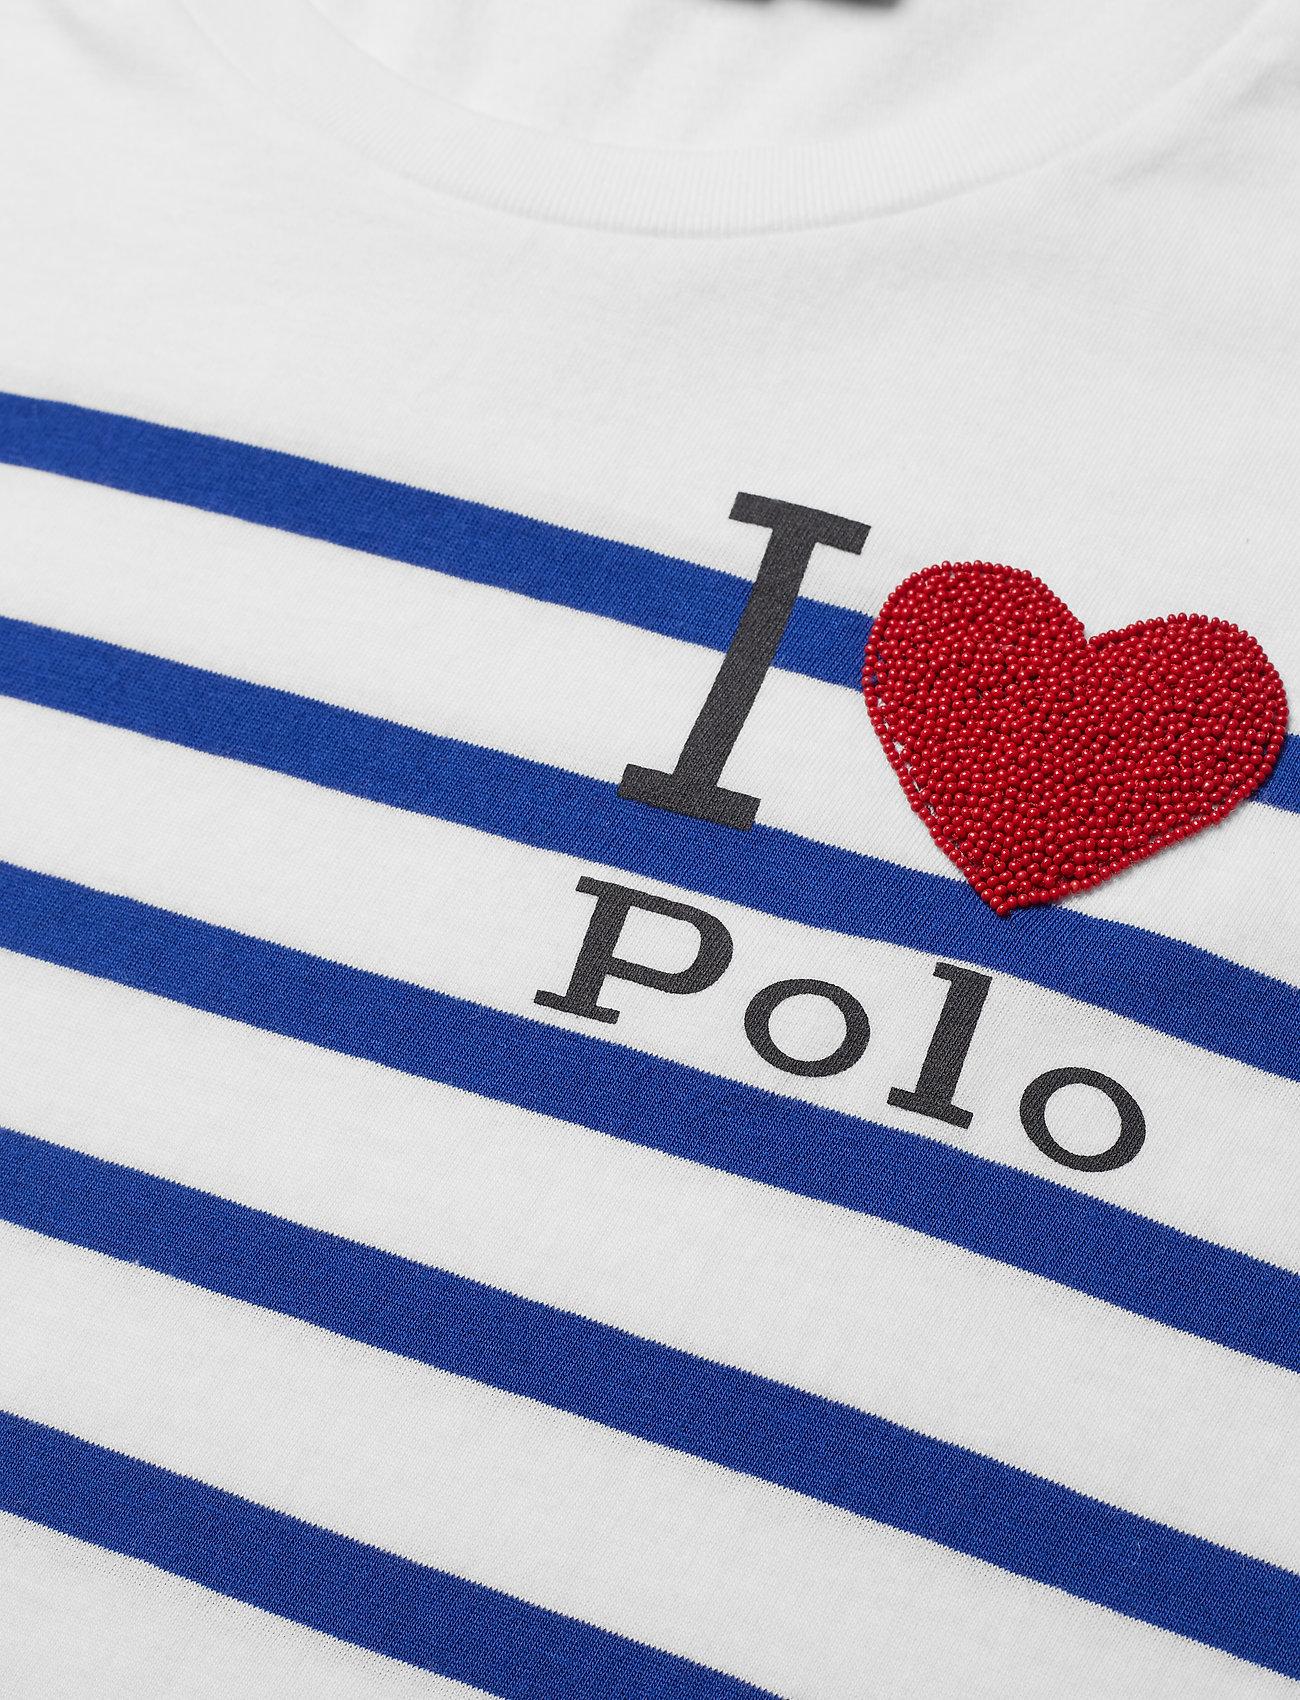 Polo Striped Graphic T-shirt (White/sistine Blu) (479.60 kr) - Polo Ralph Lauren